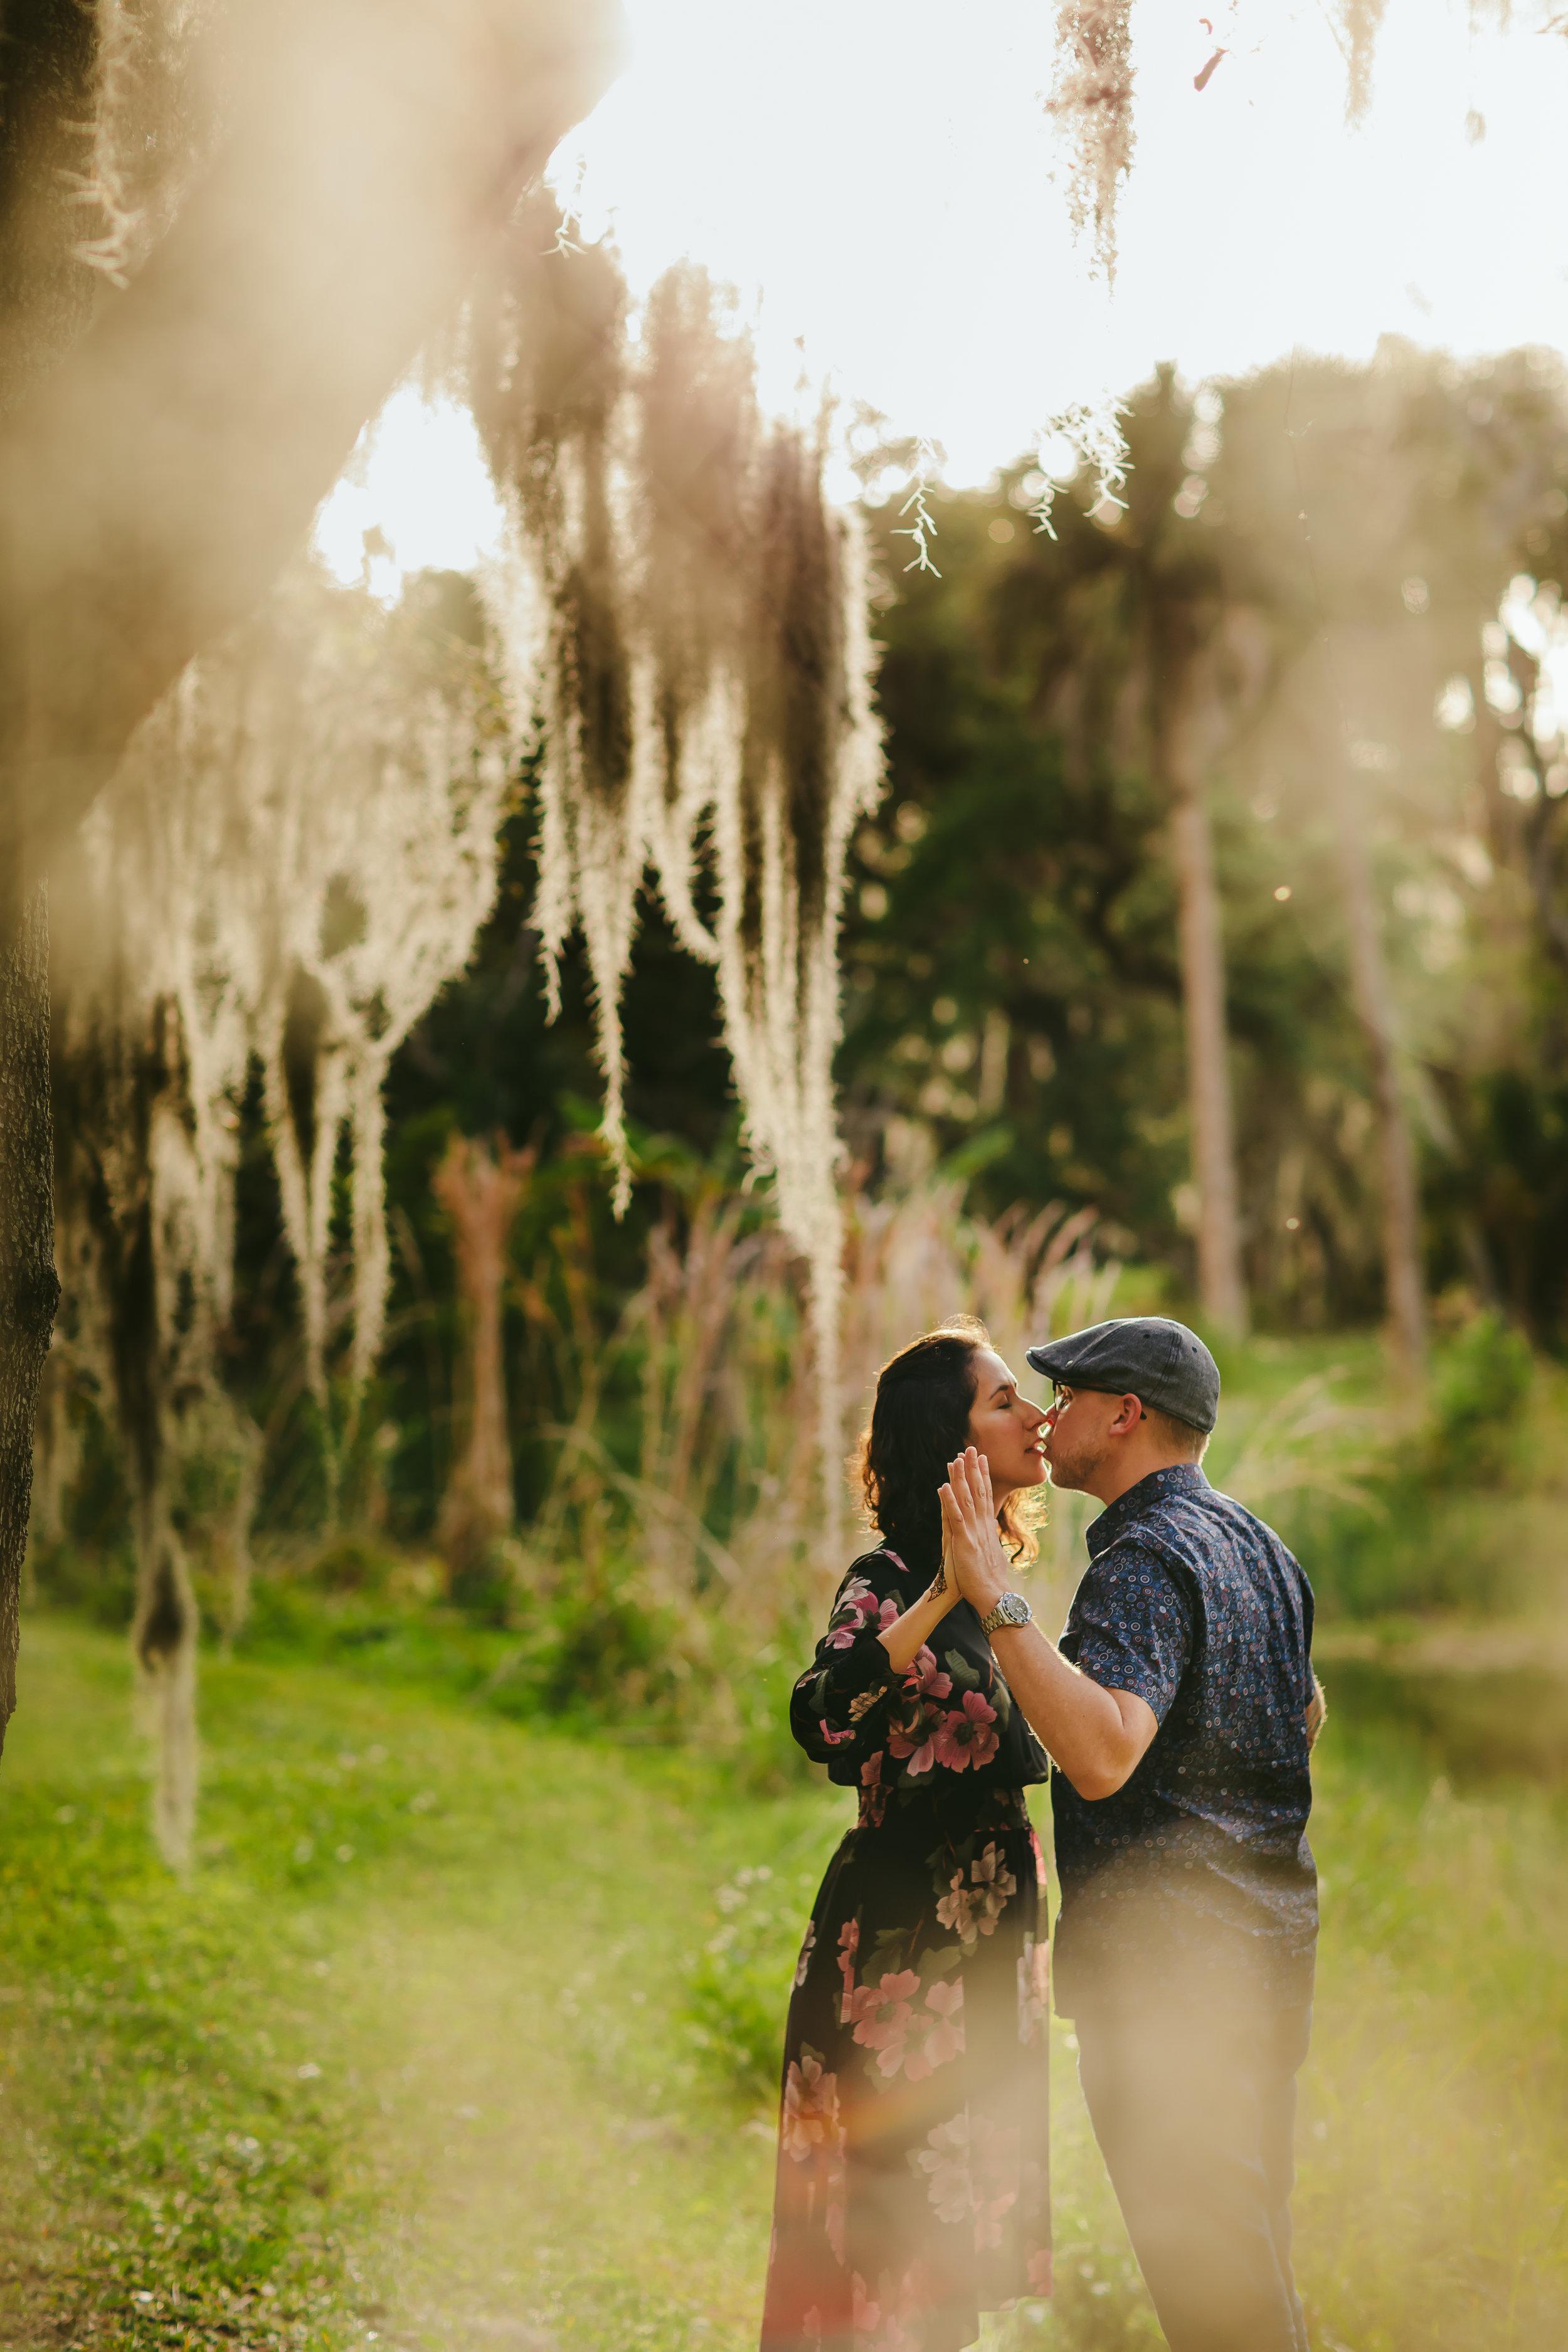 kashi-asharam-couple-portraits-friday-pre-wedding-celebration.jpg